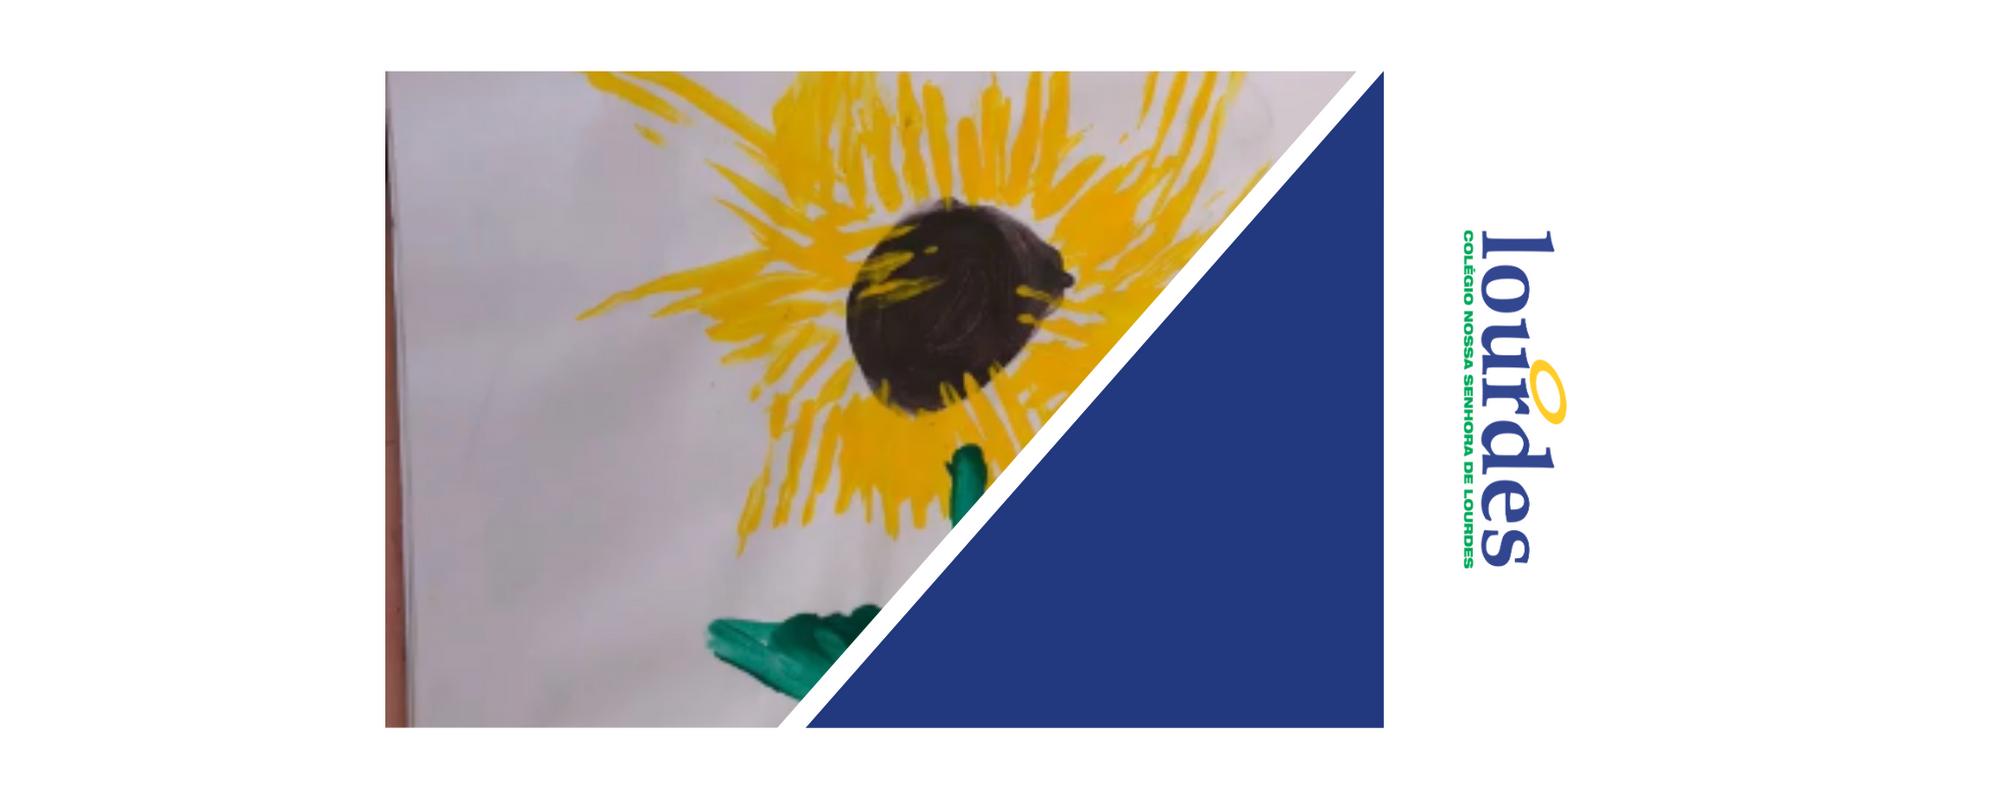 "Releitura da obra ""Os girassóis"" de Van Gogh – Infantil IV"